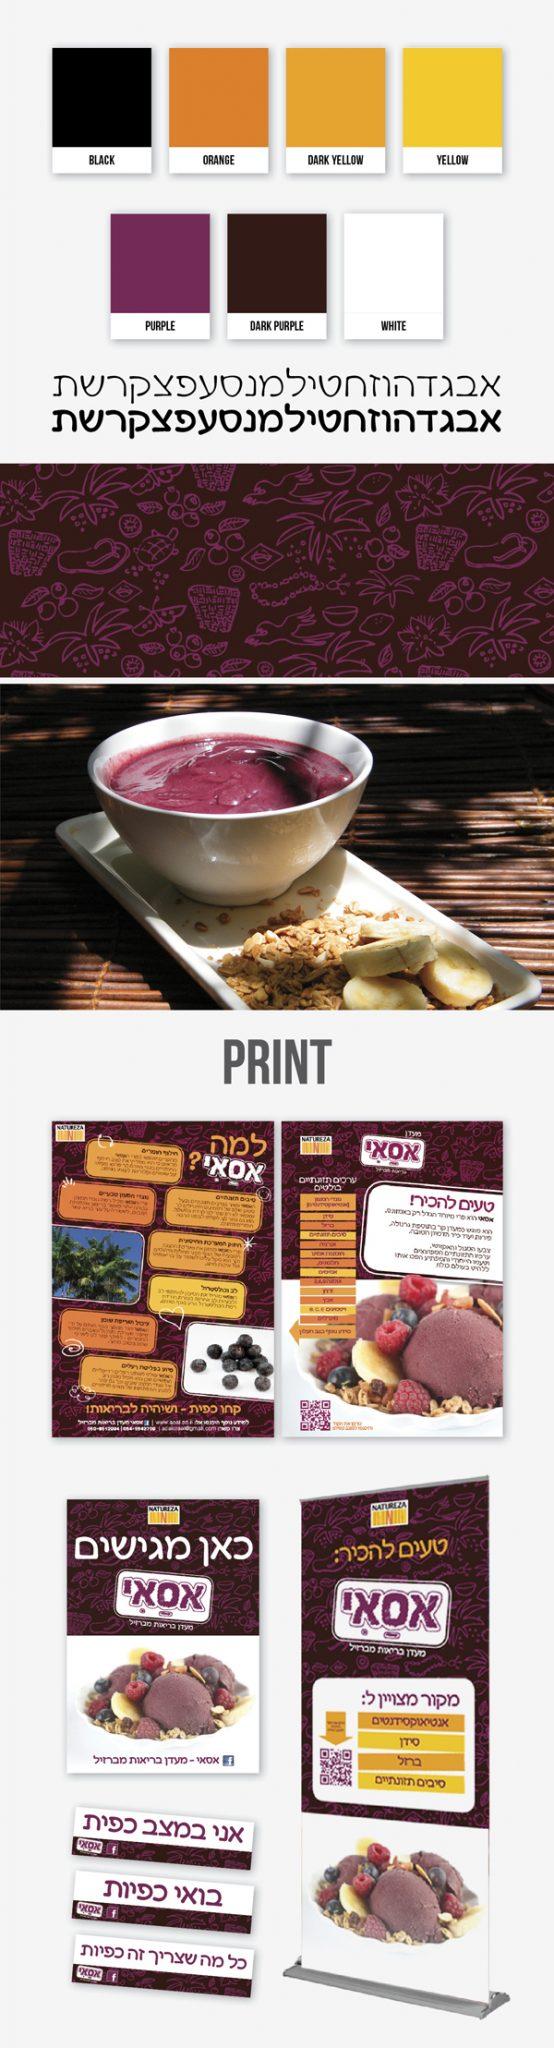 marketing, health, wellness, logo, design